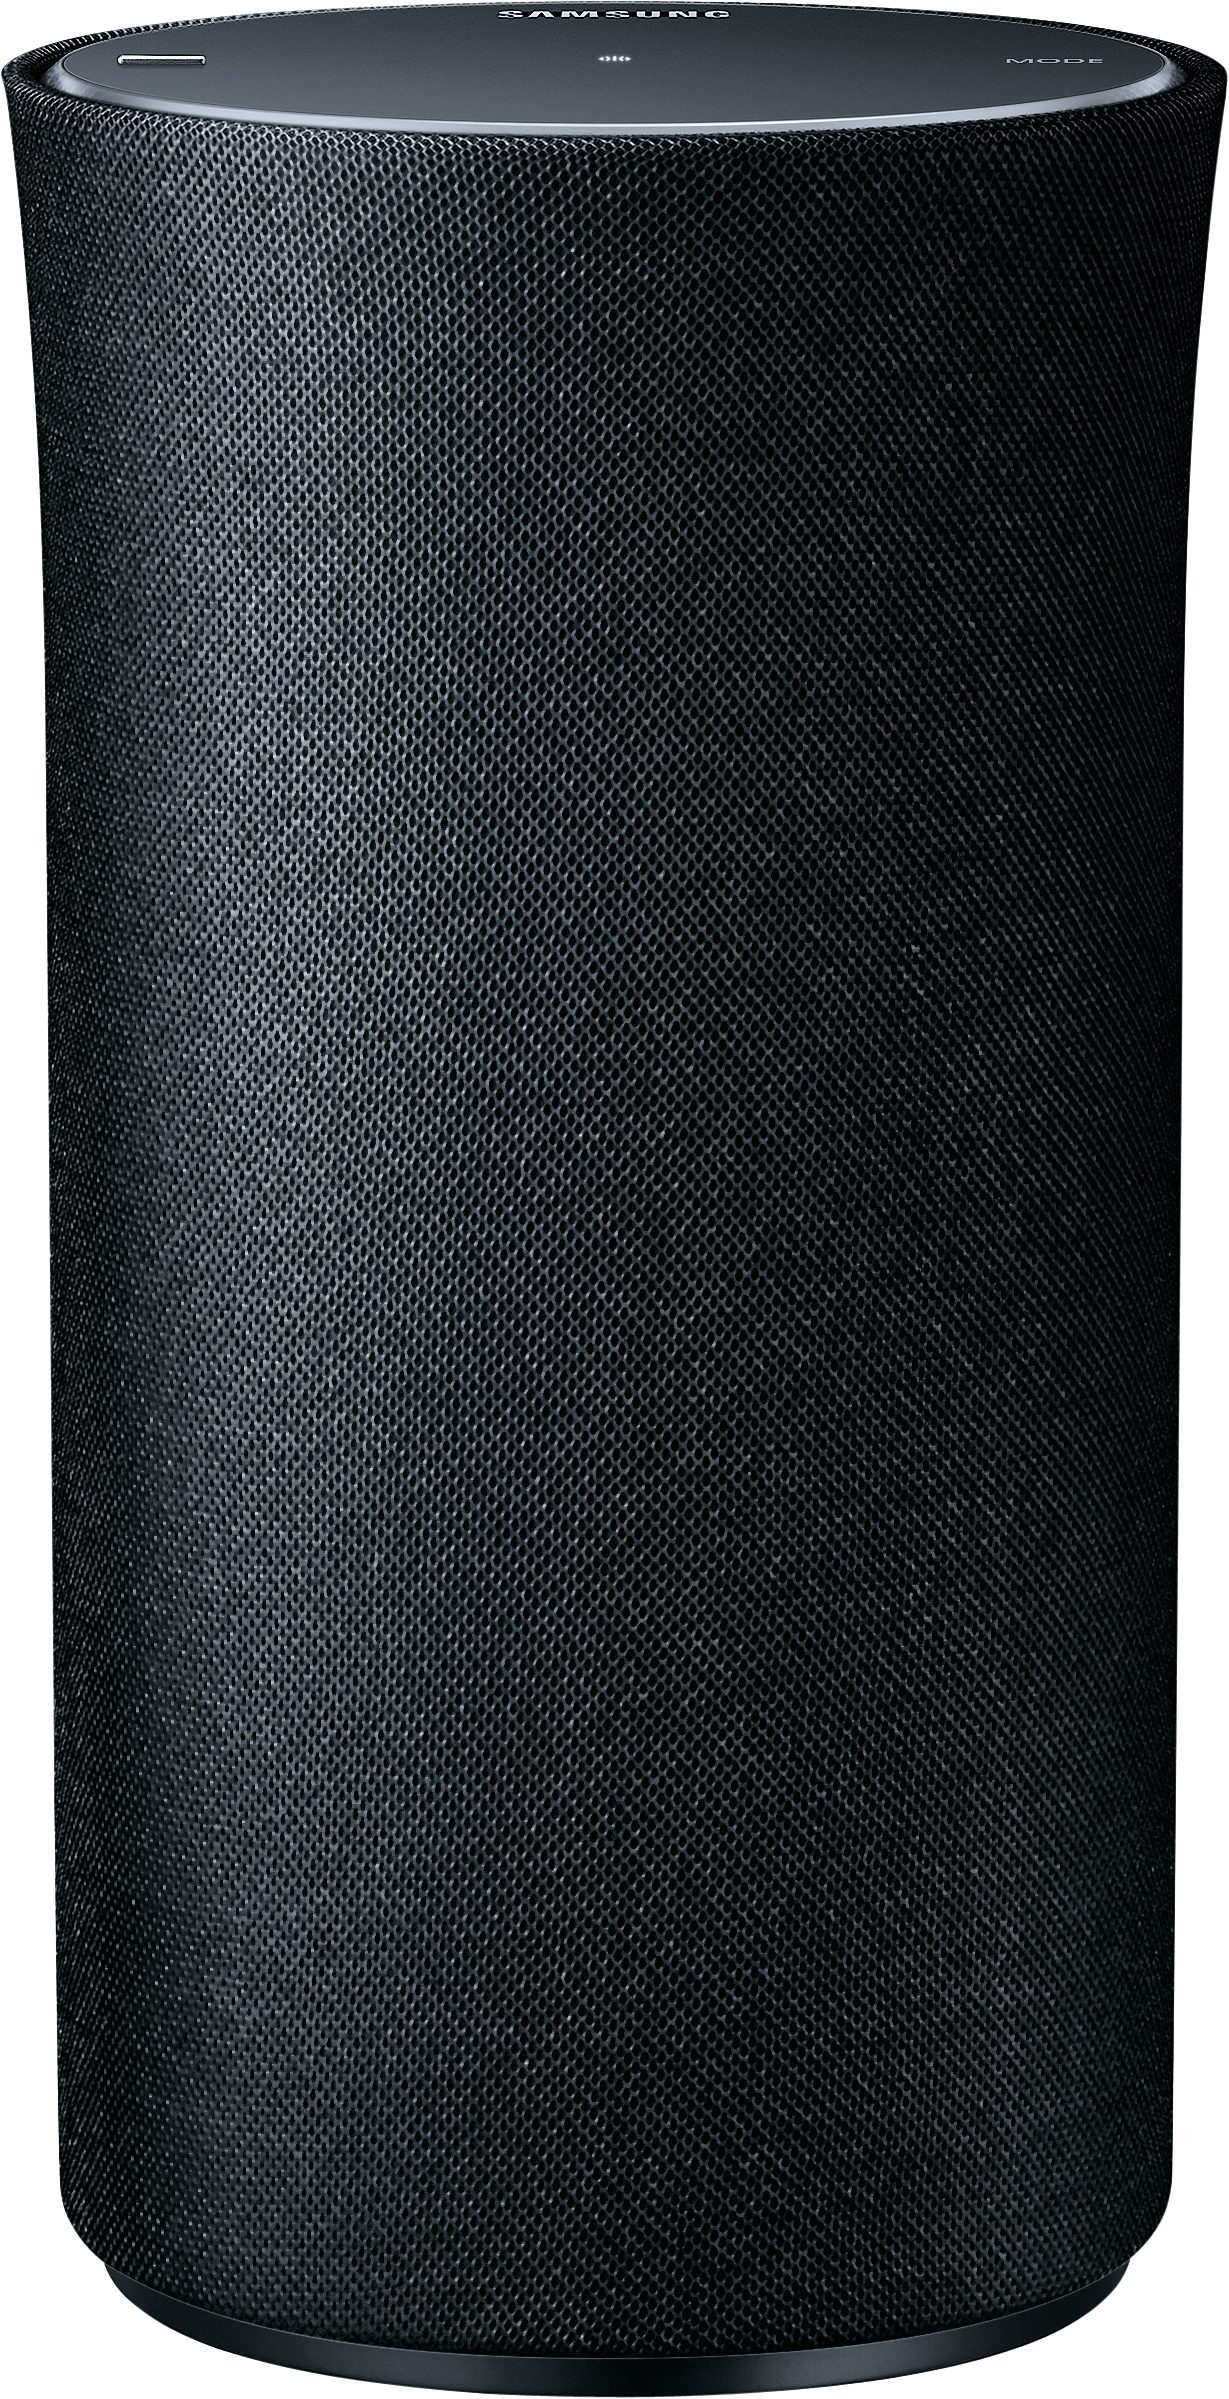 Samsung R1 WAM1500 Lautsprecher (Multiroom, Bluetooth, WiFi)